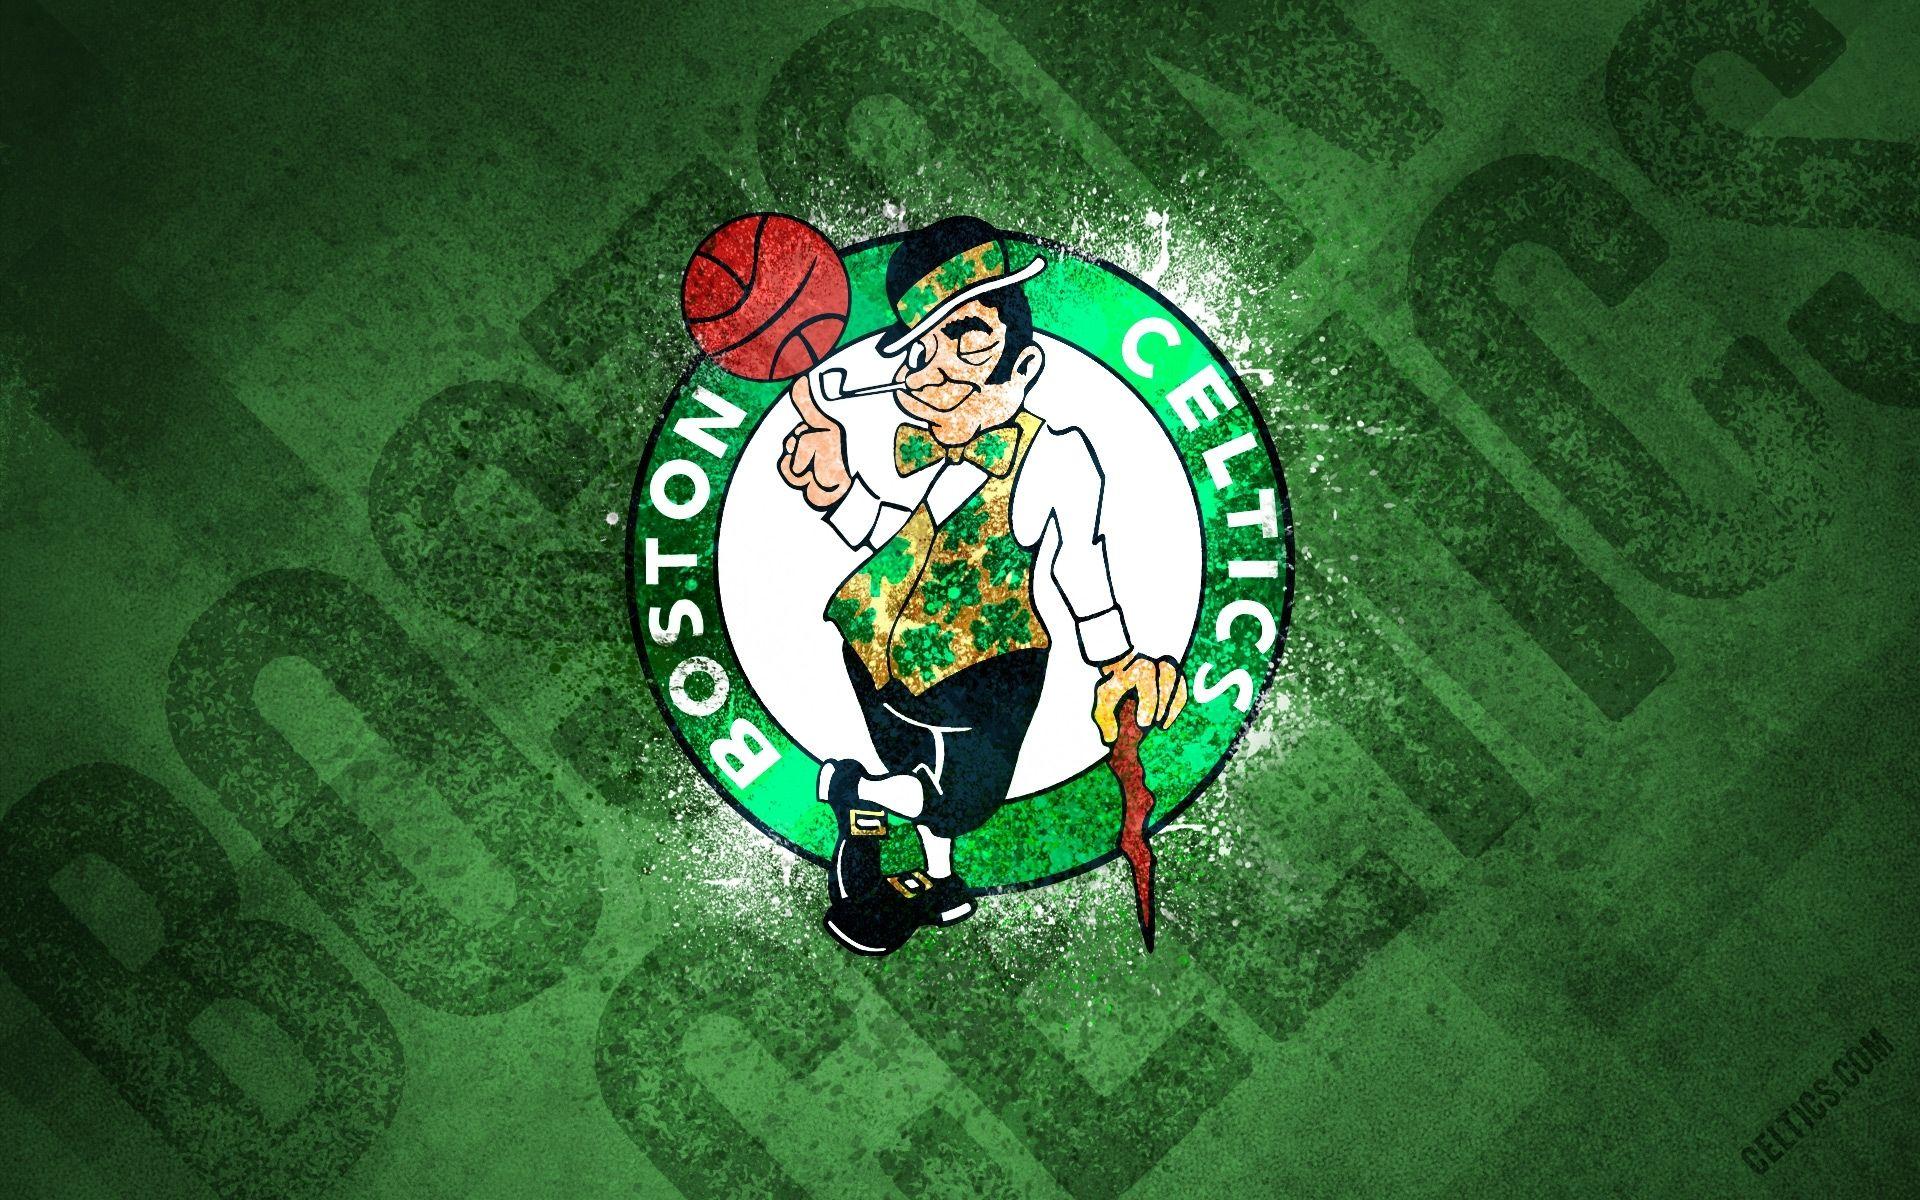 10 New Boston Celtics Hd Wallpaper Full Hd 1080p For Pc Desktop Boston Celtics Wallpaper Boston Celtics Boston Celtics Logo